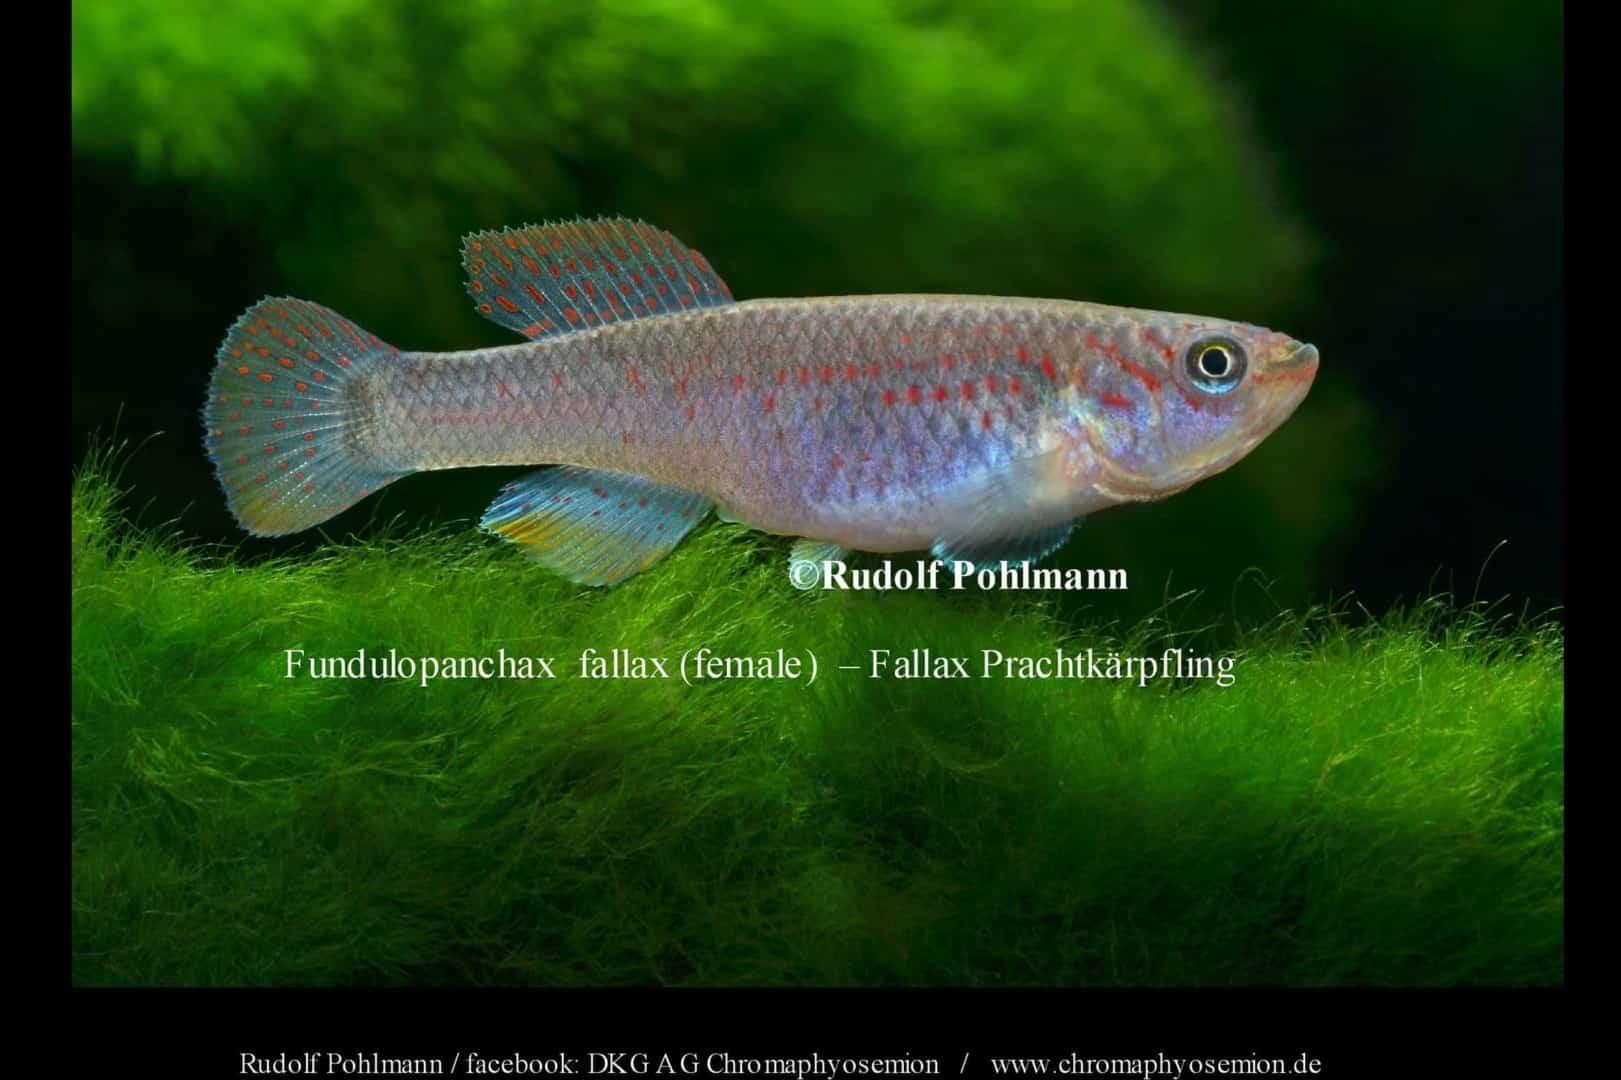 Fundulopanchax fallax – Fallax Prachtkärpfling 1